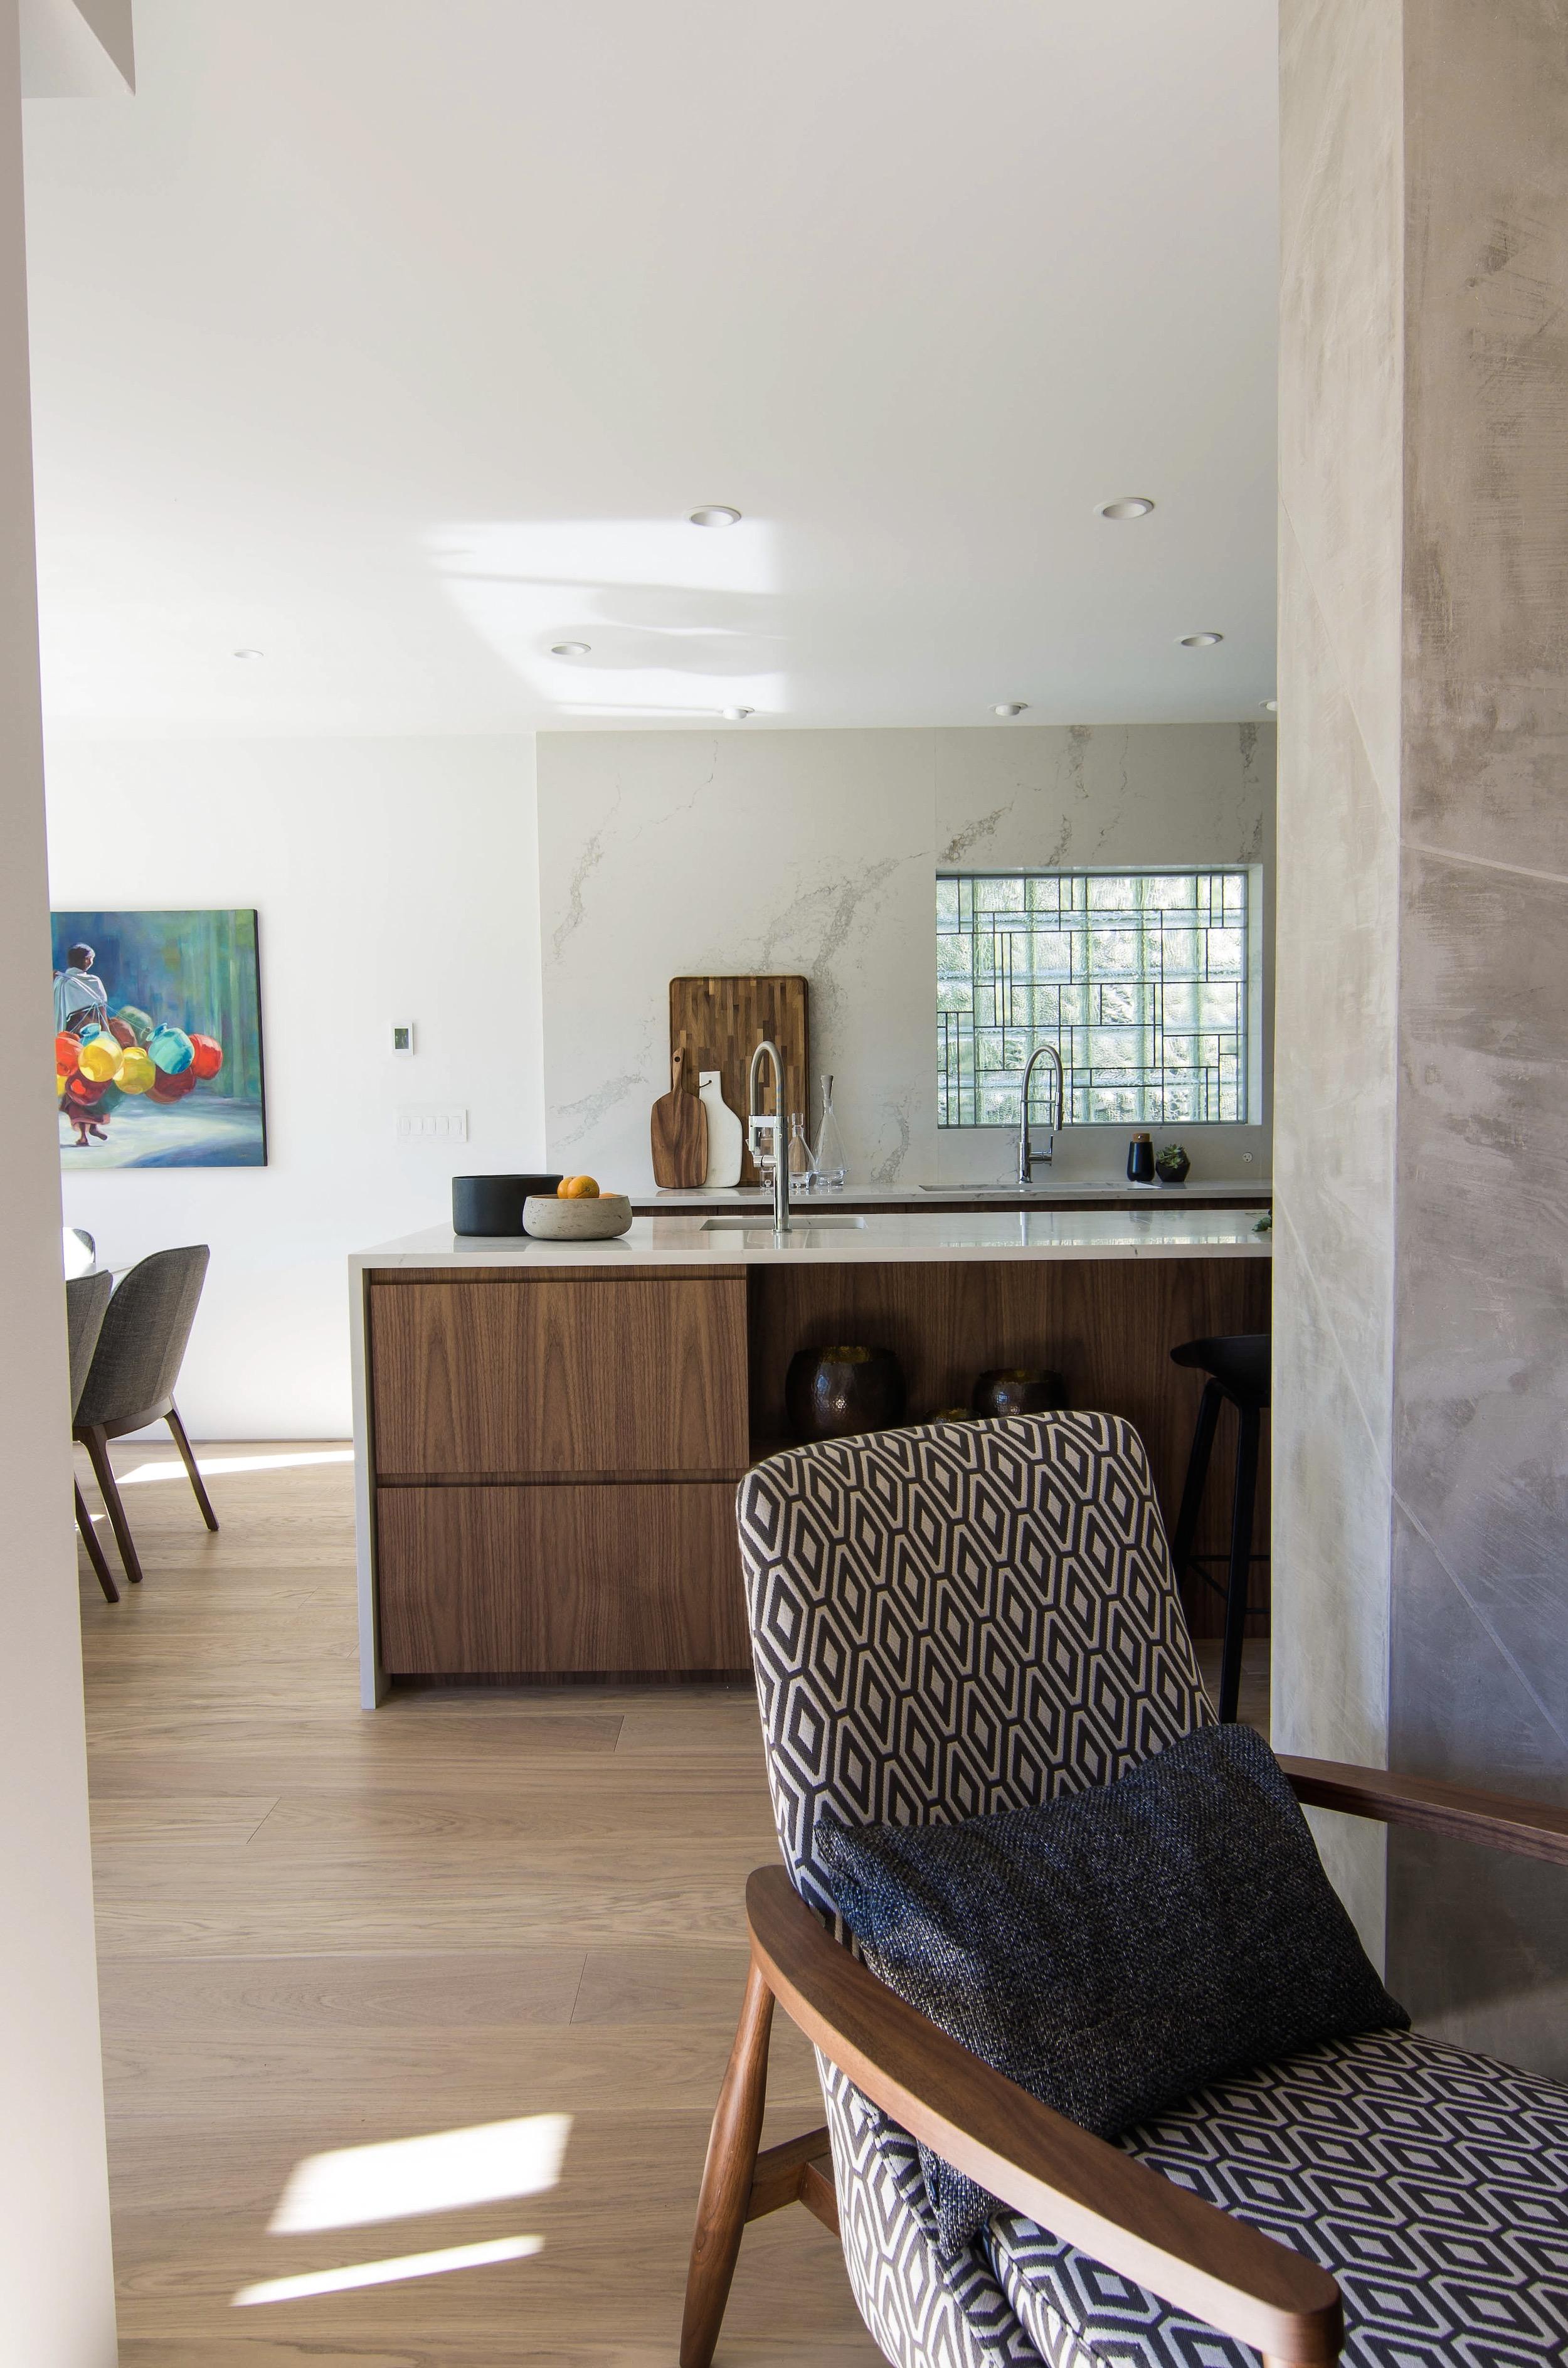 KRC_Spyglass_Living_Room_Kitchen.JPG